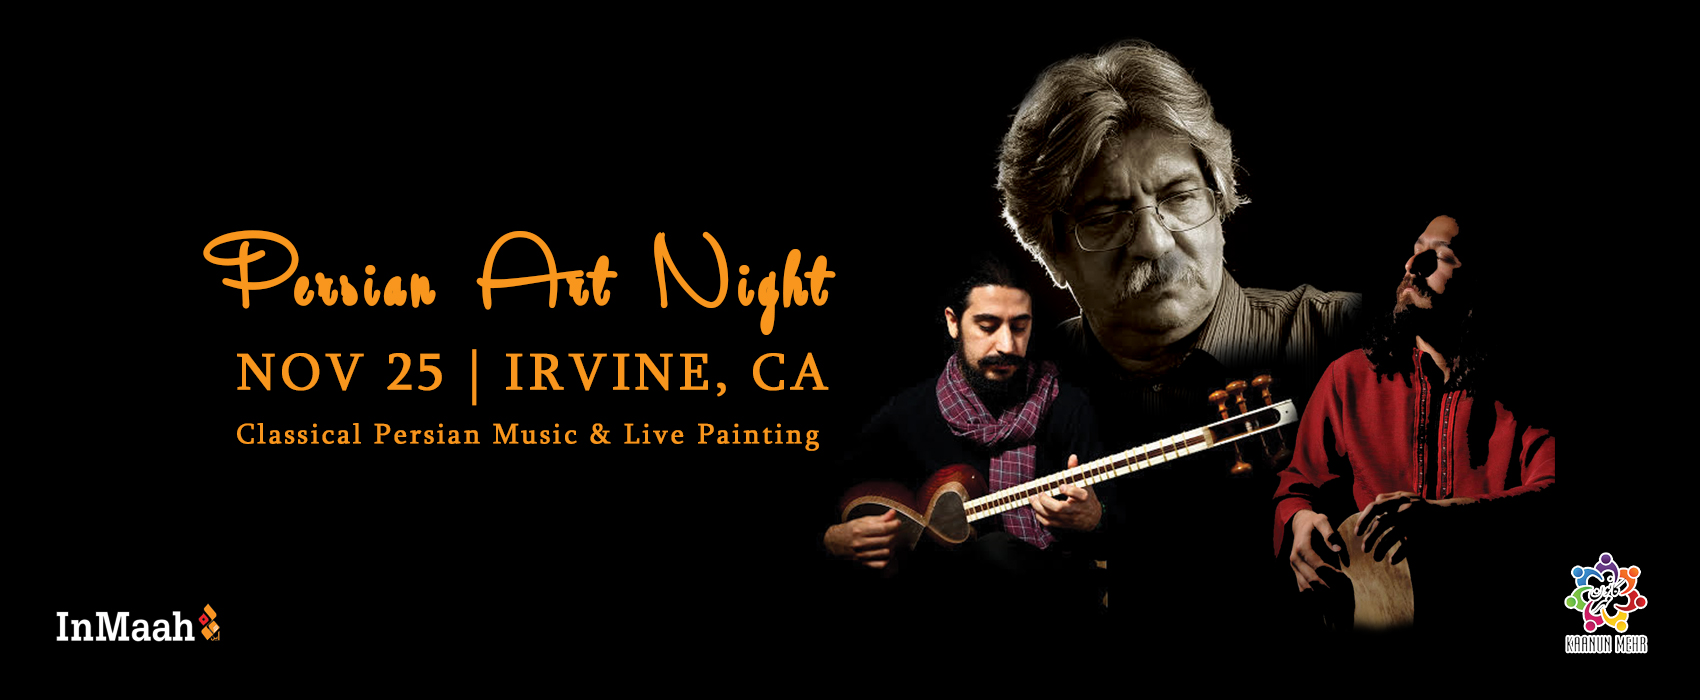 Persian Art Night w/ Akhavass | InMaah Magazine | Iranian Magazine San Diego, Orange County, Los Angeles